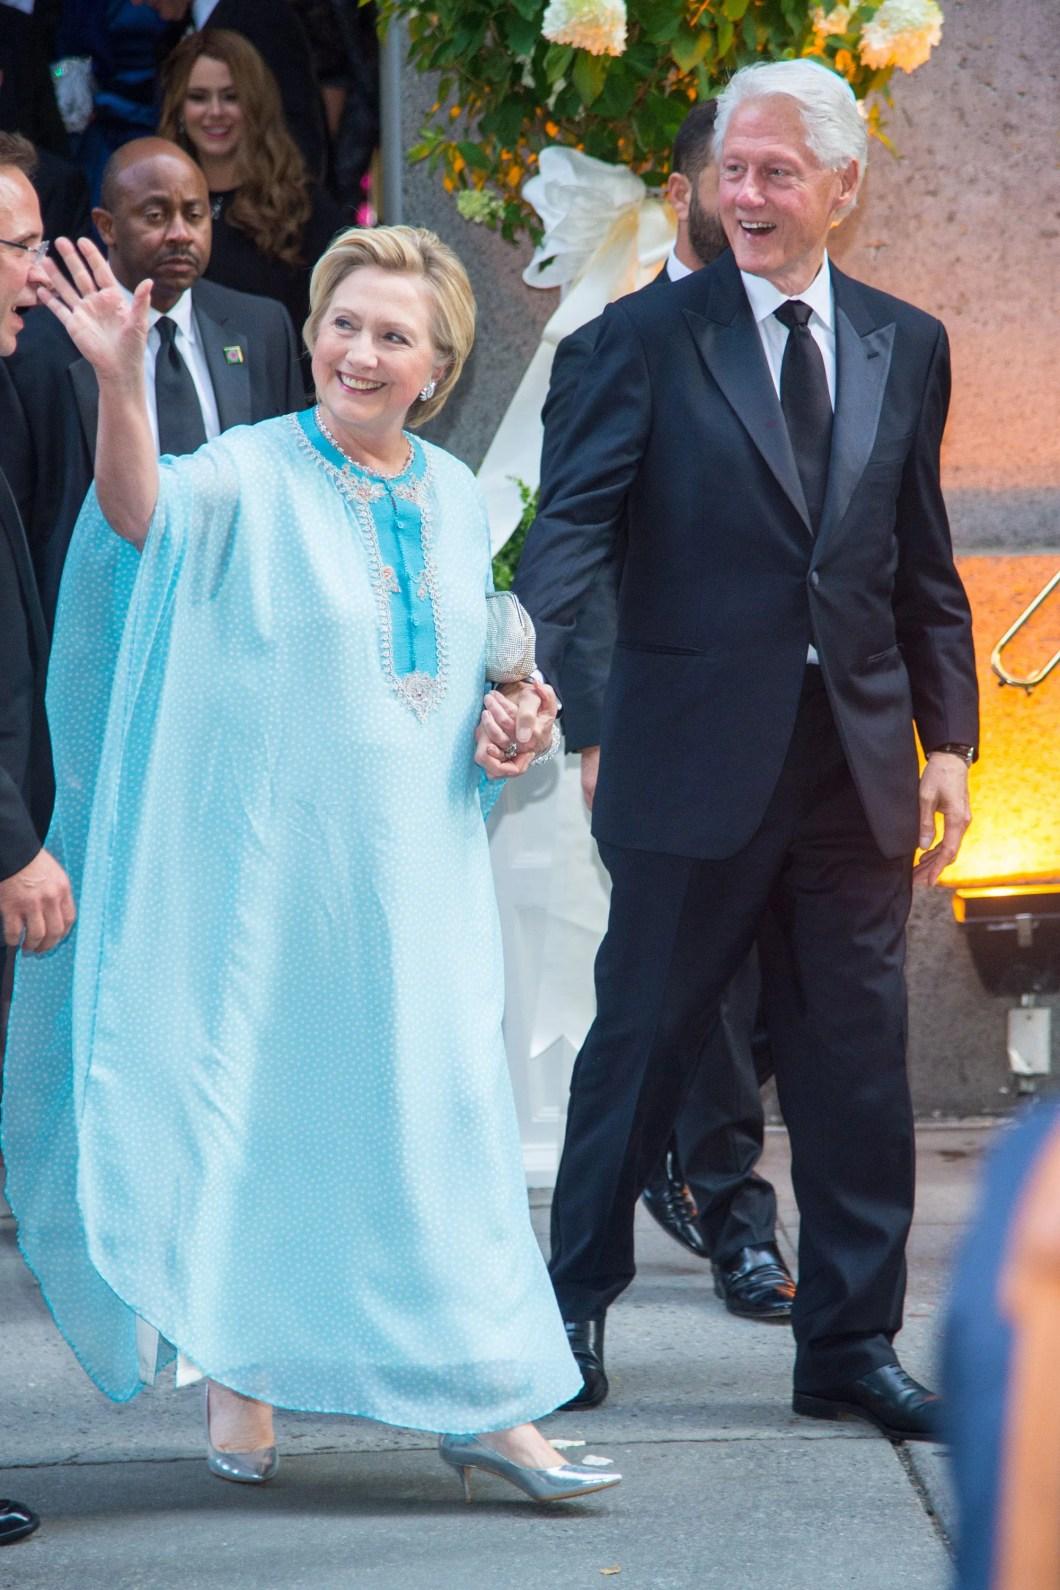 hillary clinton wedding   Invitationjdi.co